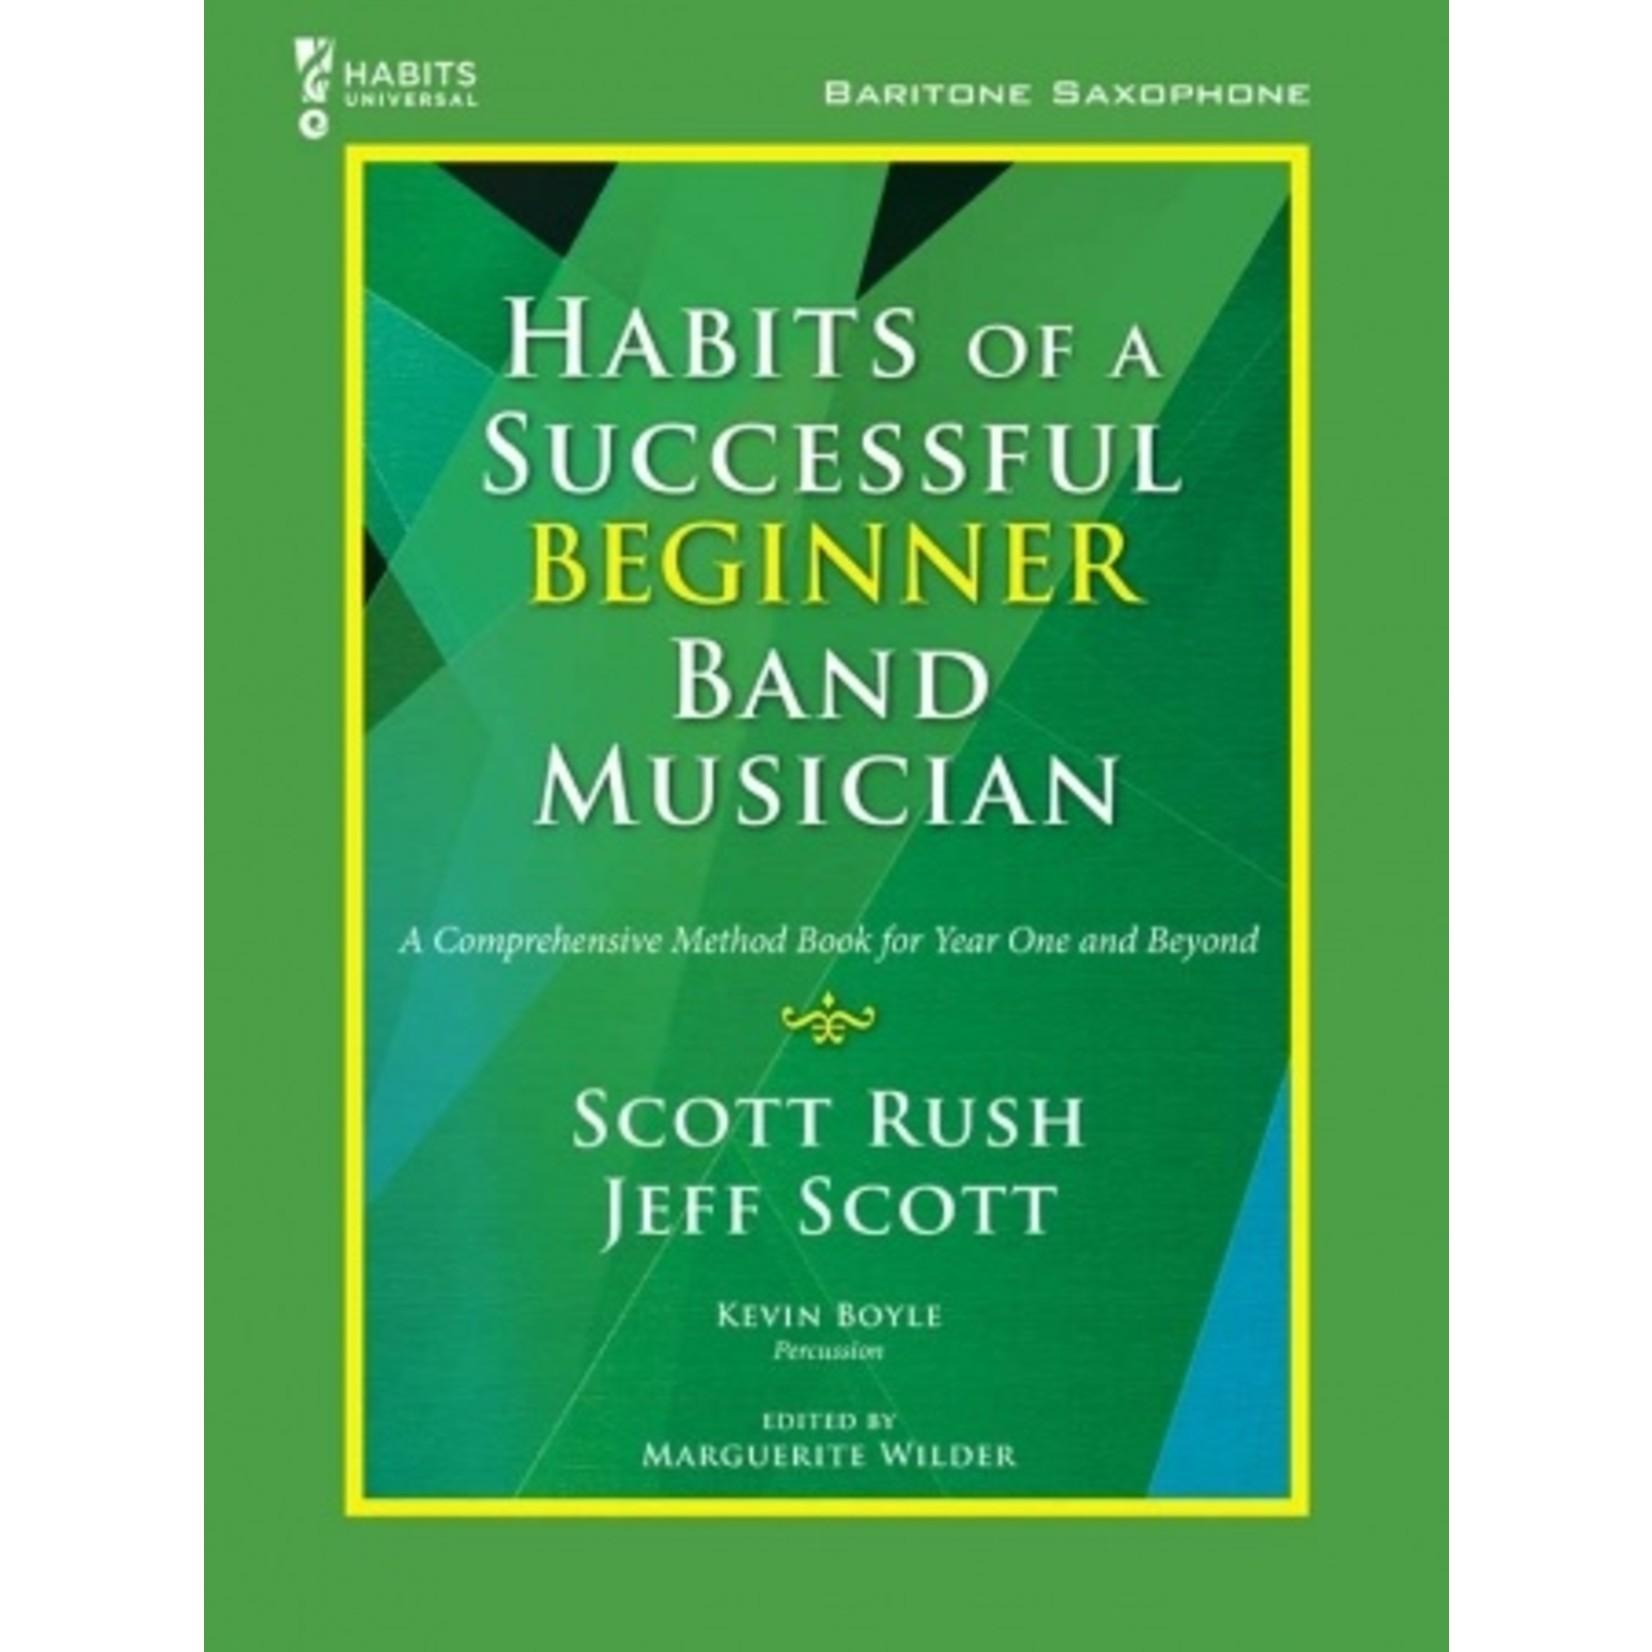 Habits of a Successful Beginner Band Musician - Baritone Sax